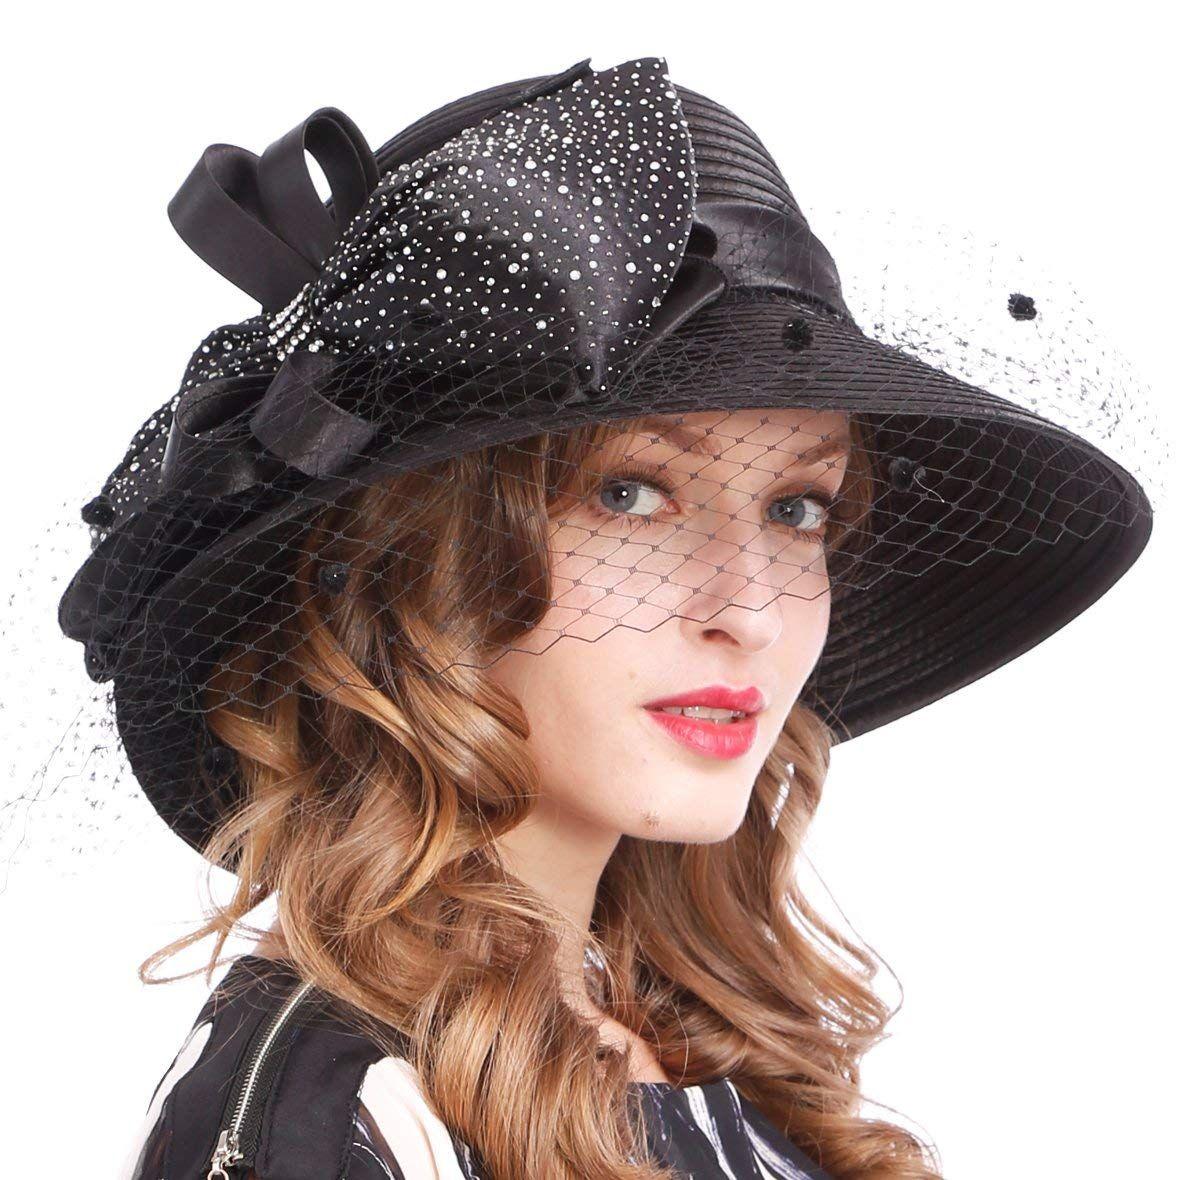 c516564e76a  29.99 Kentucky Derby Dress Church Cloche Hat Sweet Cute Floral Bucket Hat  (black) at Amazon Women s Clothing store